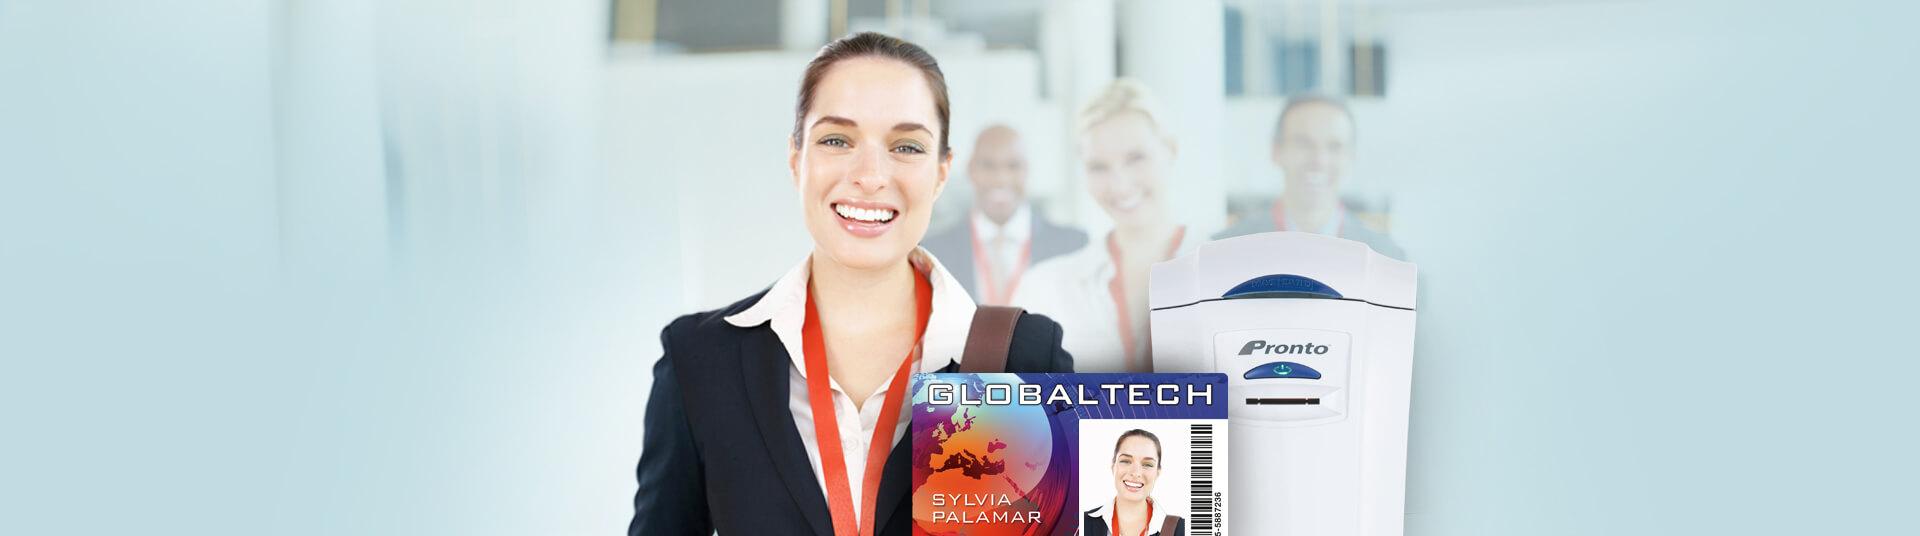 employee id badge system alphacard